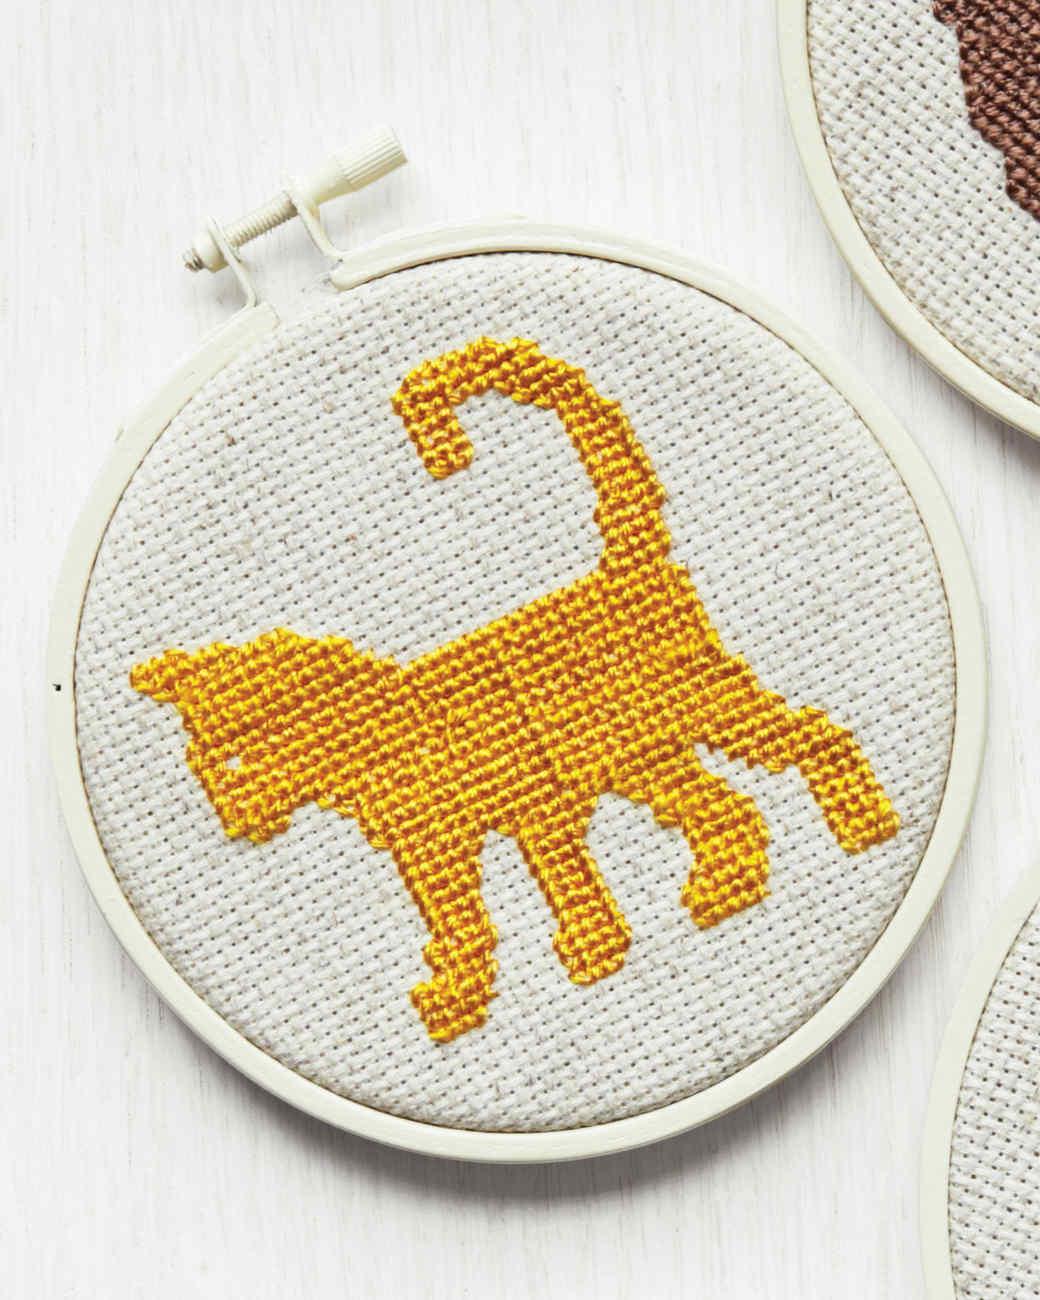 mld106899_0311_animals_cat.jpg